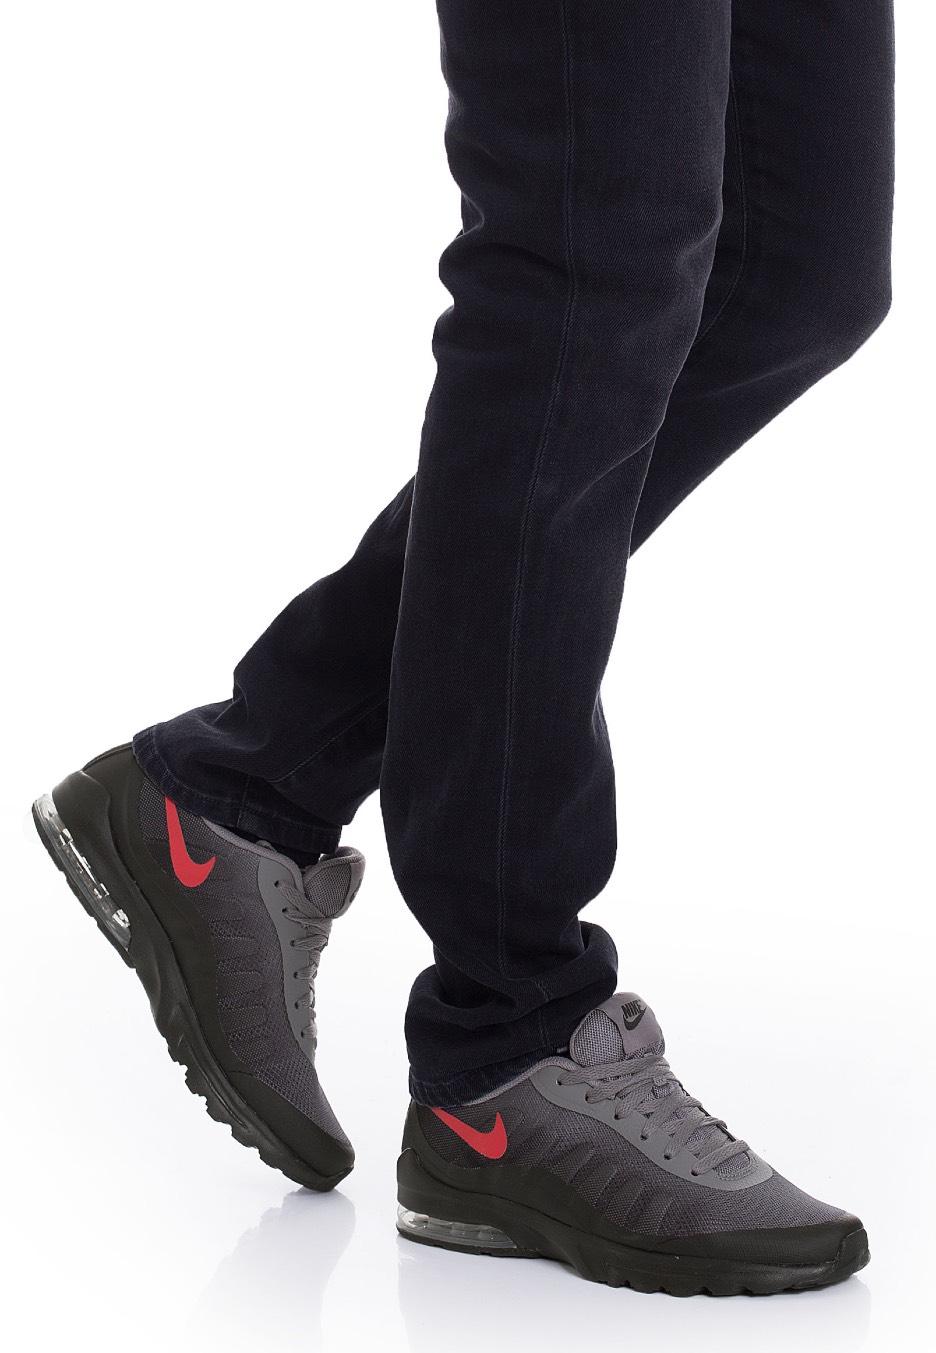 Nike - Air Max Invigor Print Gunsmoke University Red Black - Shoes ... 438c02fb0